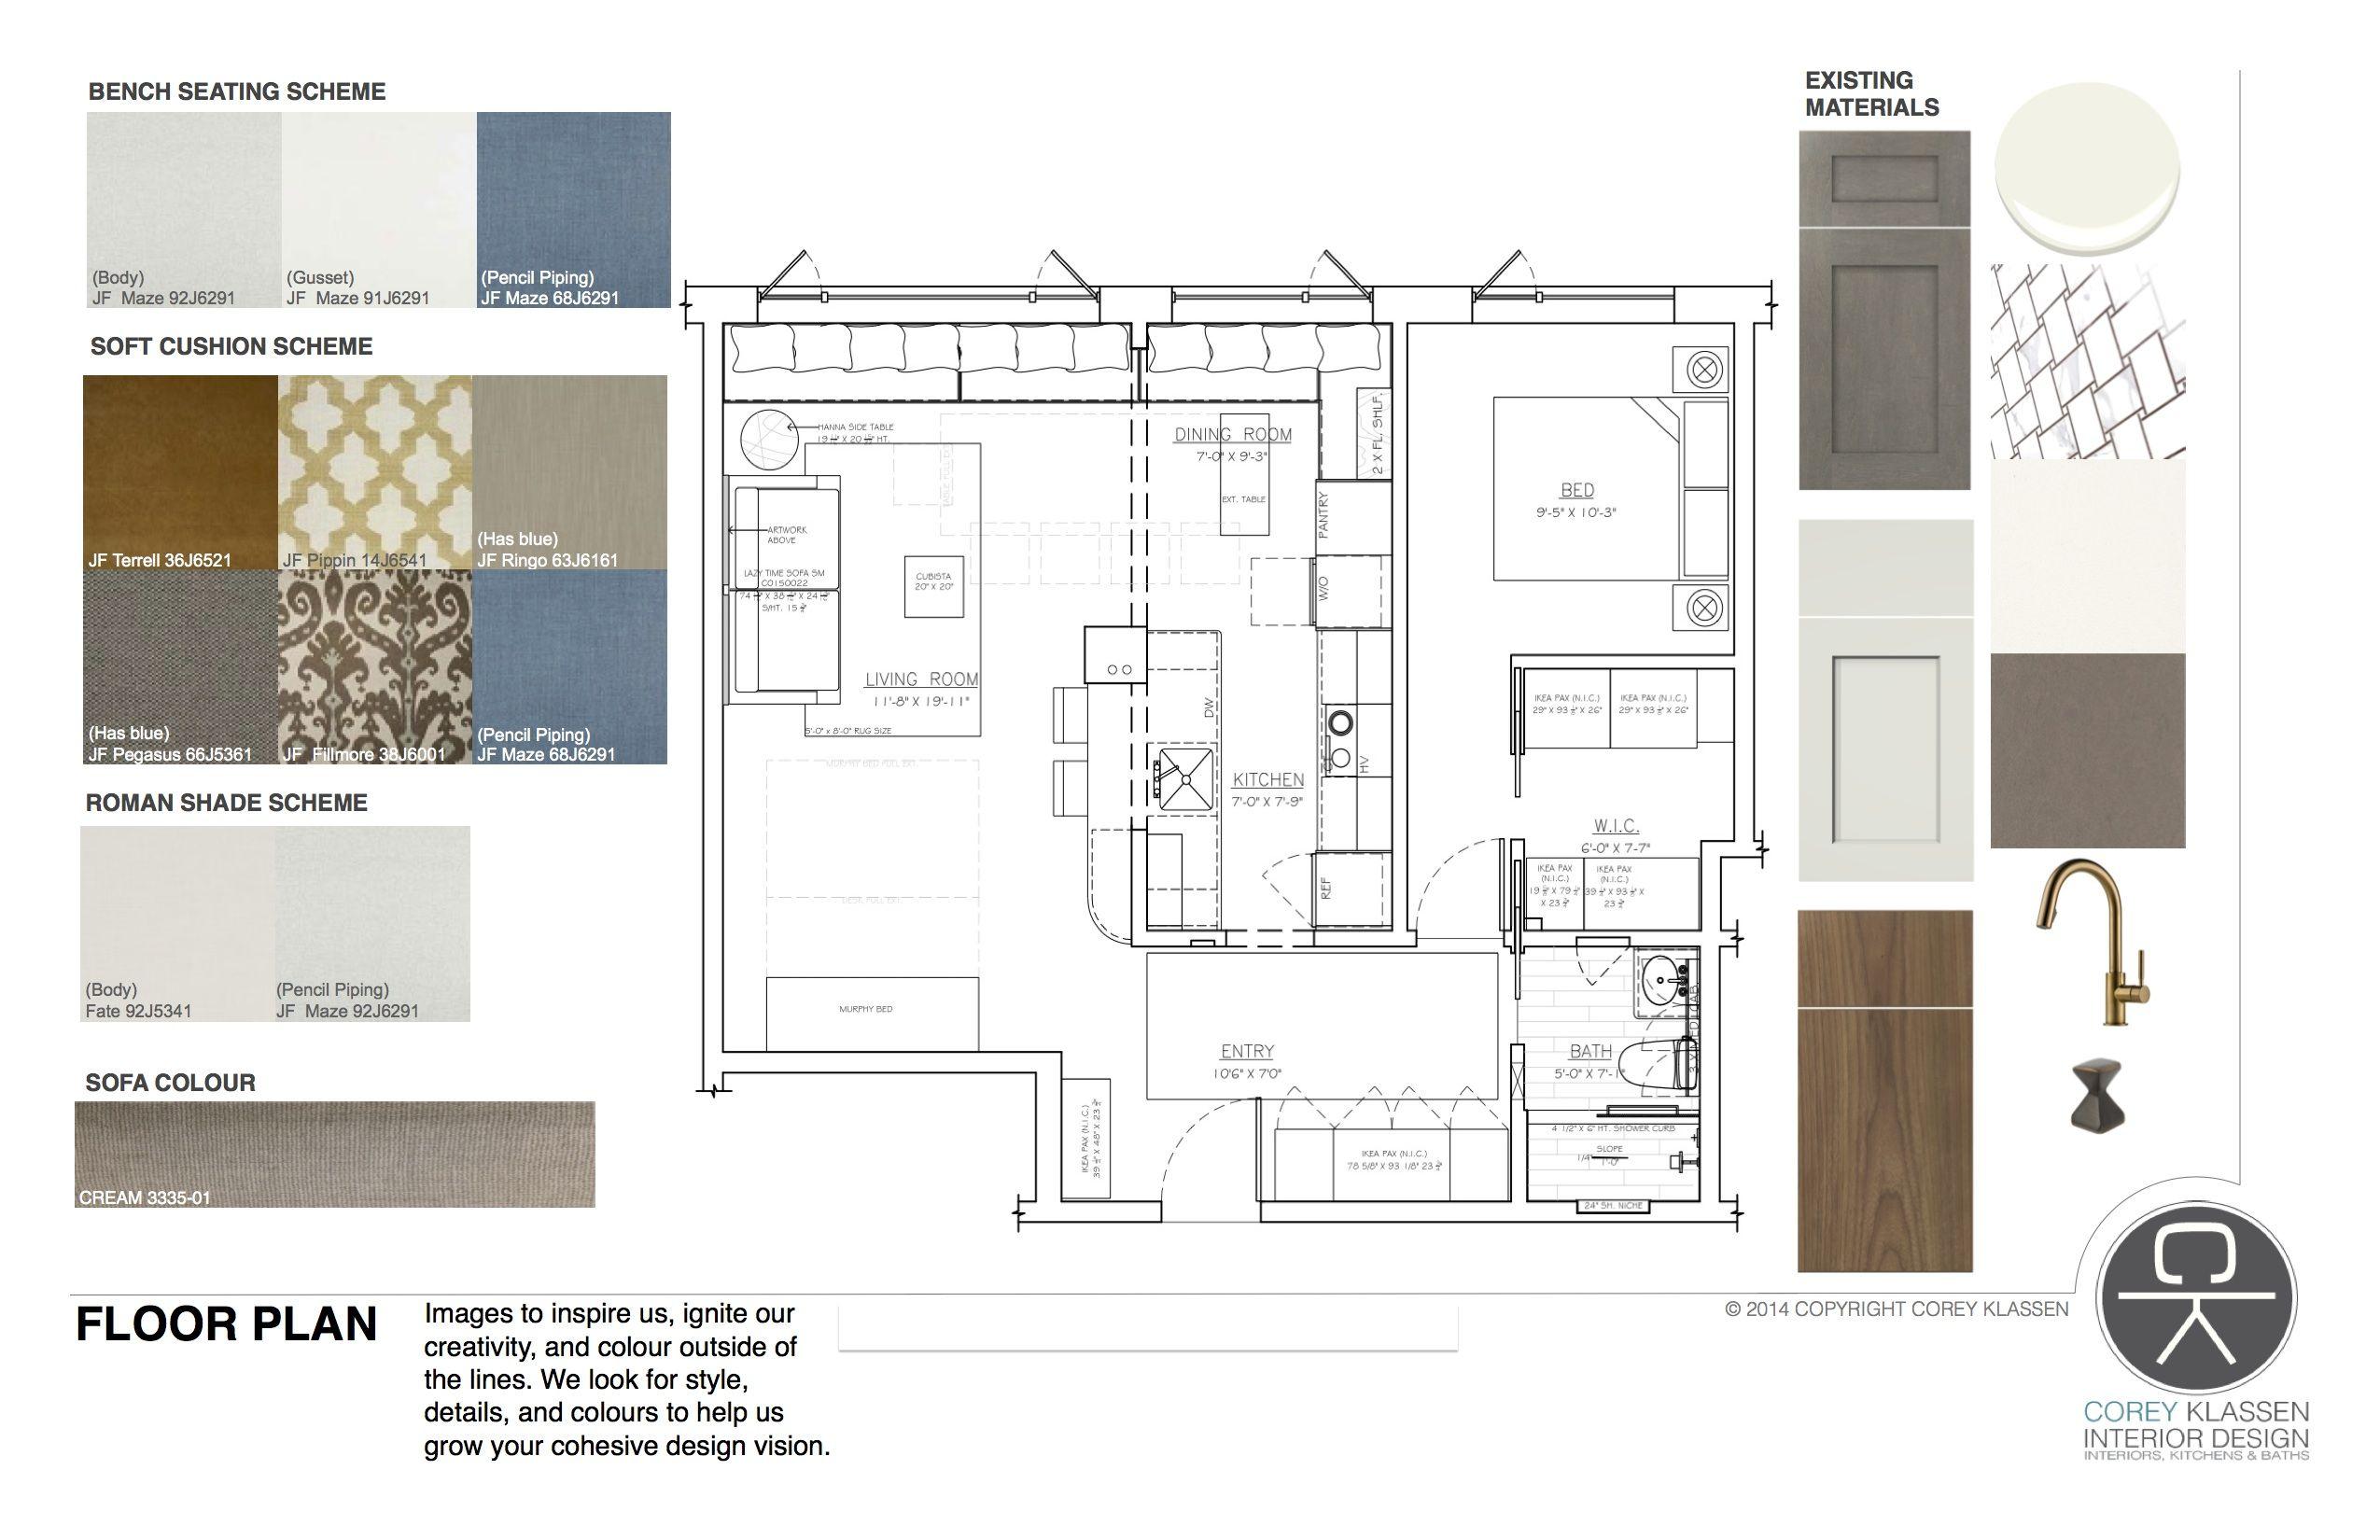 Corey Klassen Interior Design Buenavista Project Concept